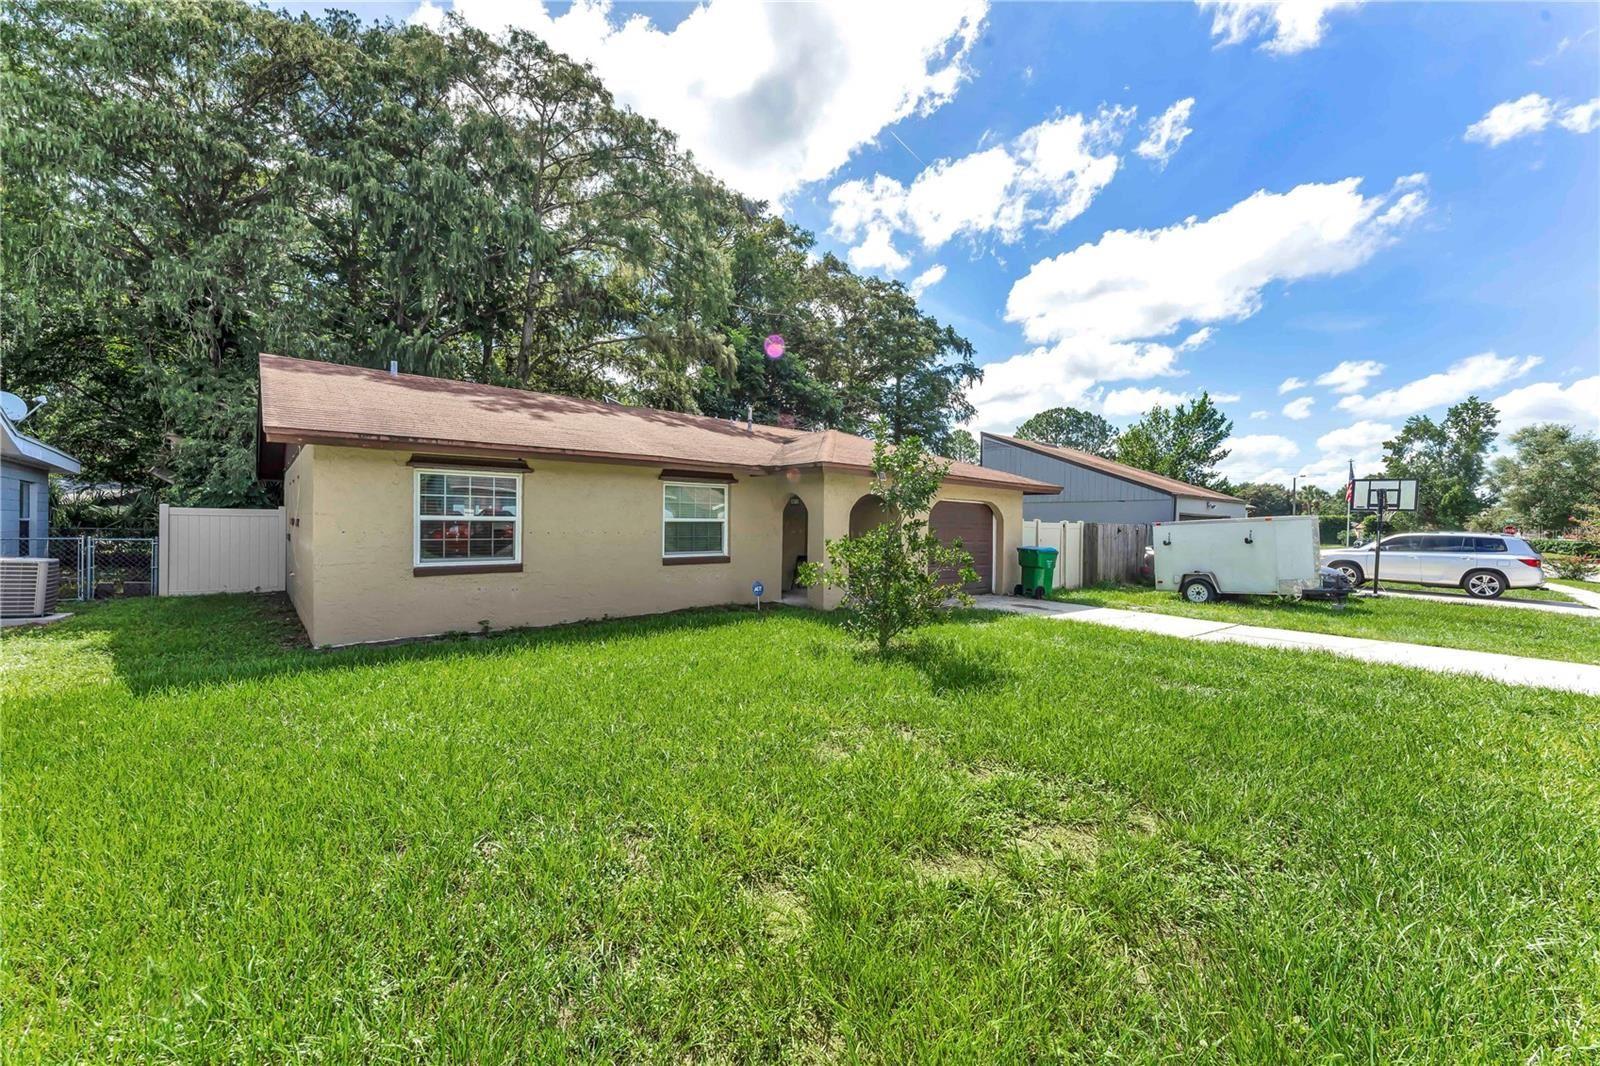 307 S EDGEMON AVENUE, Winter Springs, FL 32708 - #: O5968747